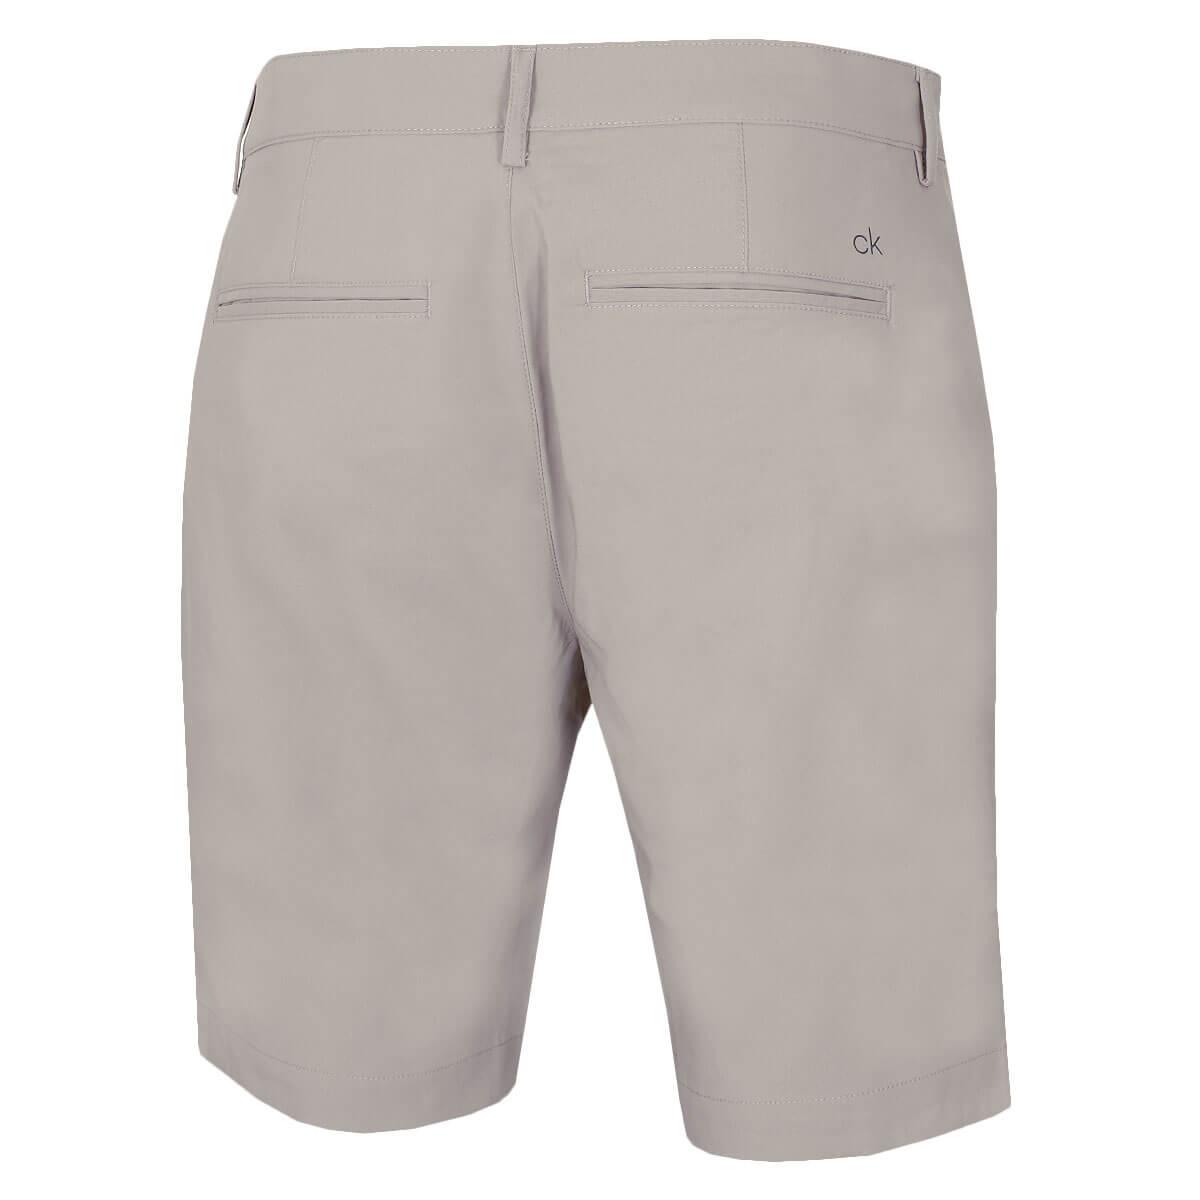 thumbnail 15 - Calvin Klein Mens 2021 Slim Fit Micro Tech Lightweight Golf Shorts 34% OFF RRP